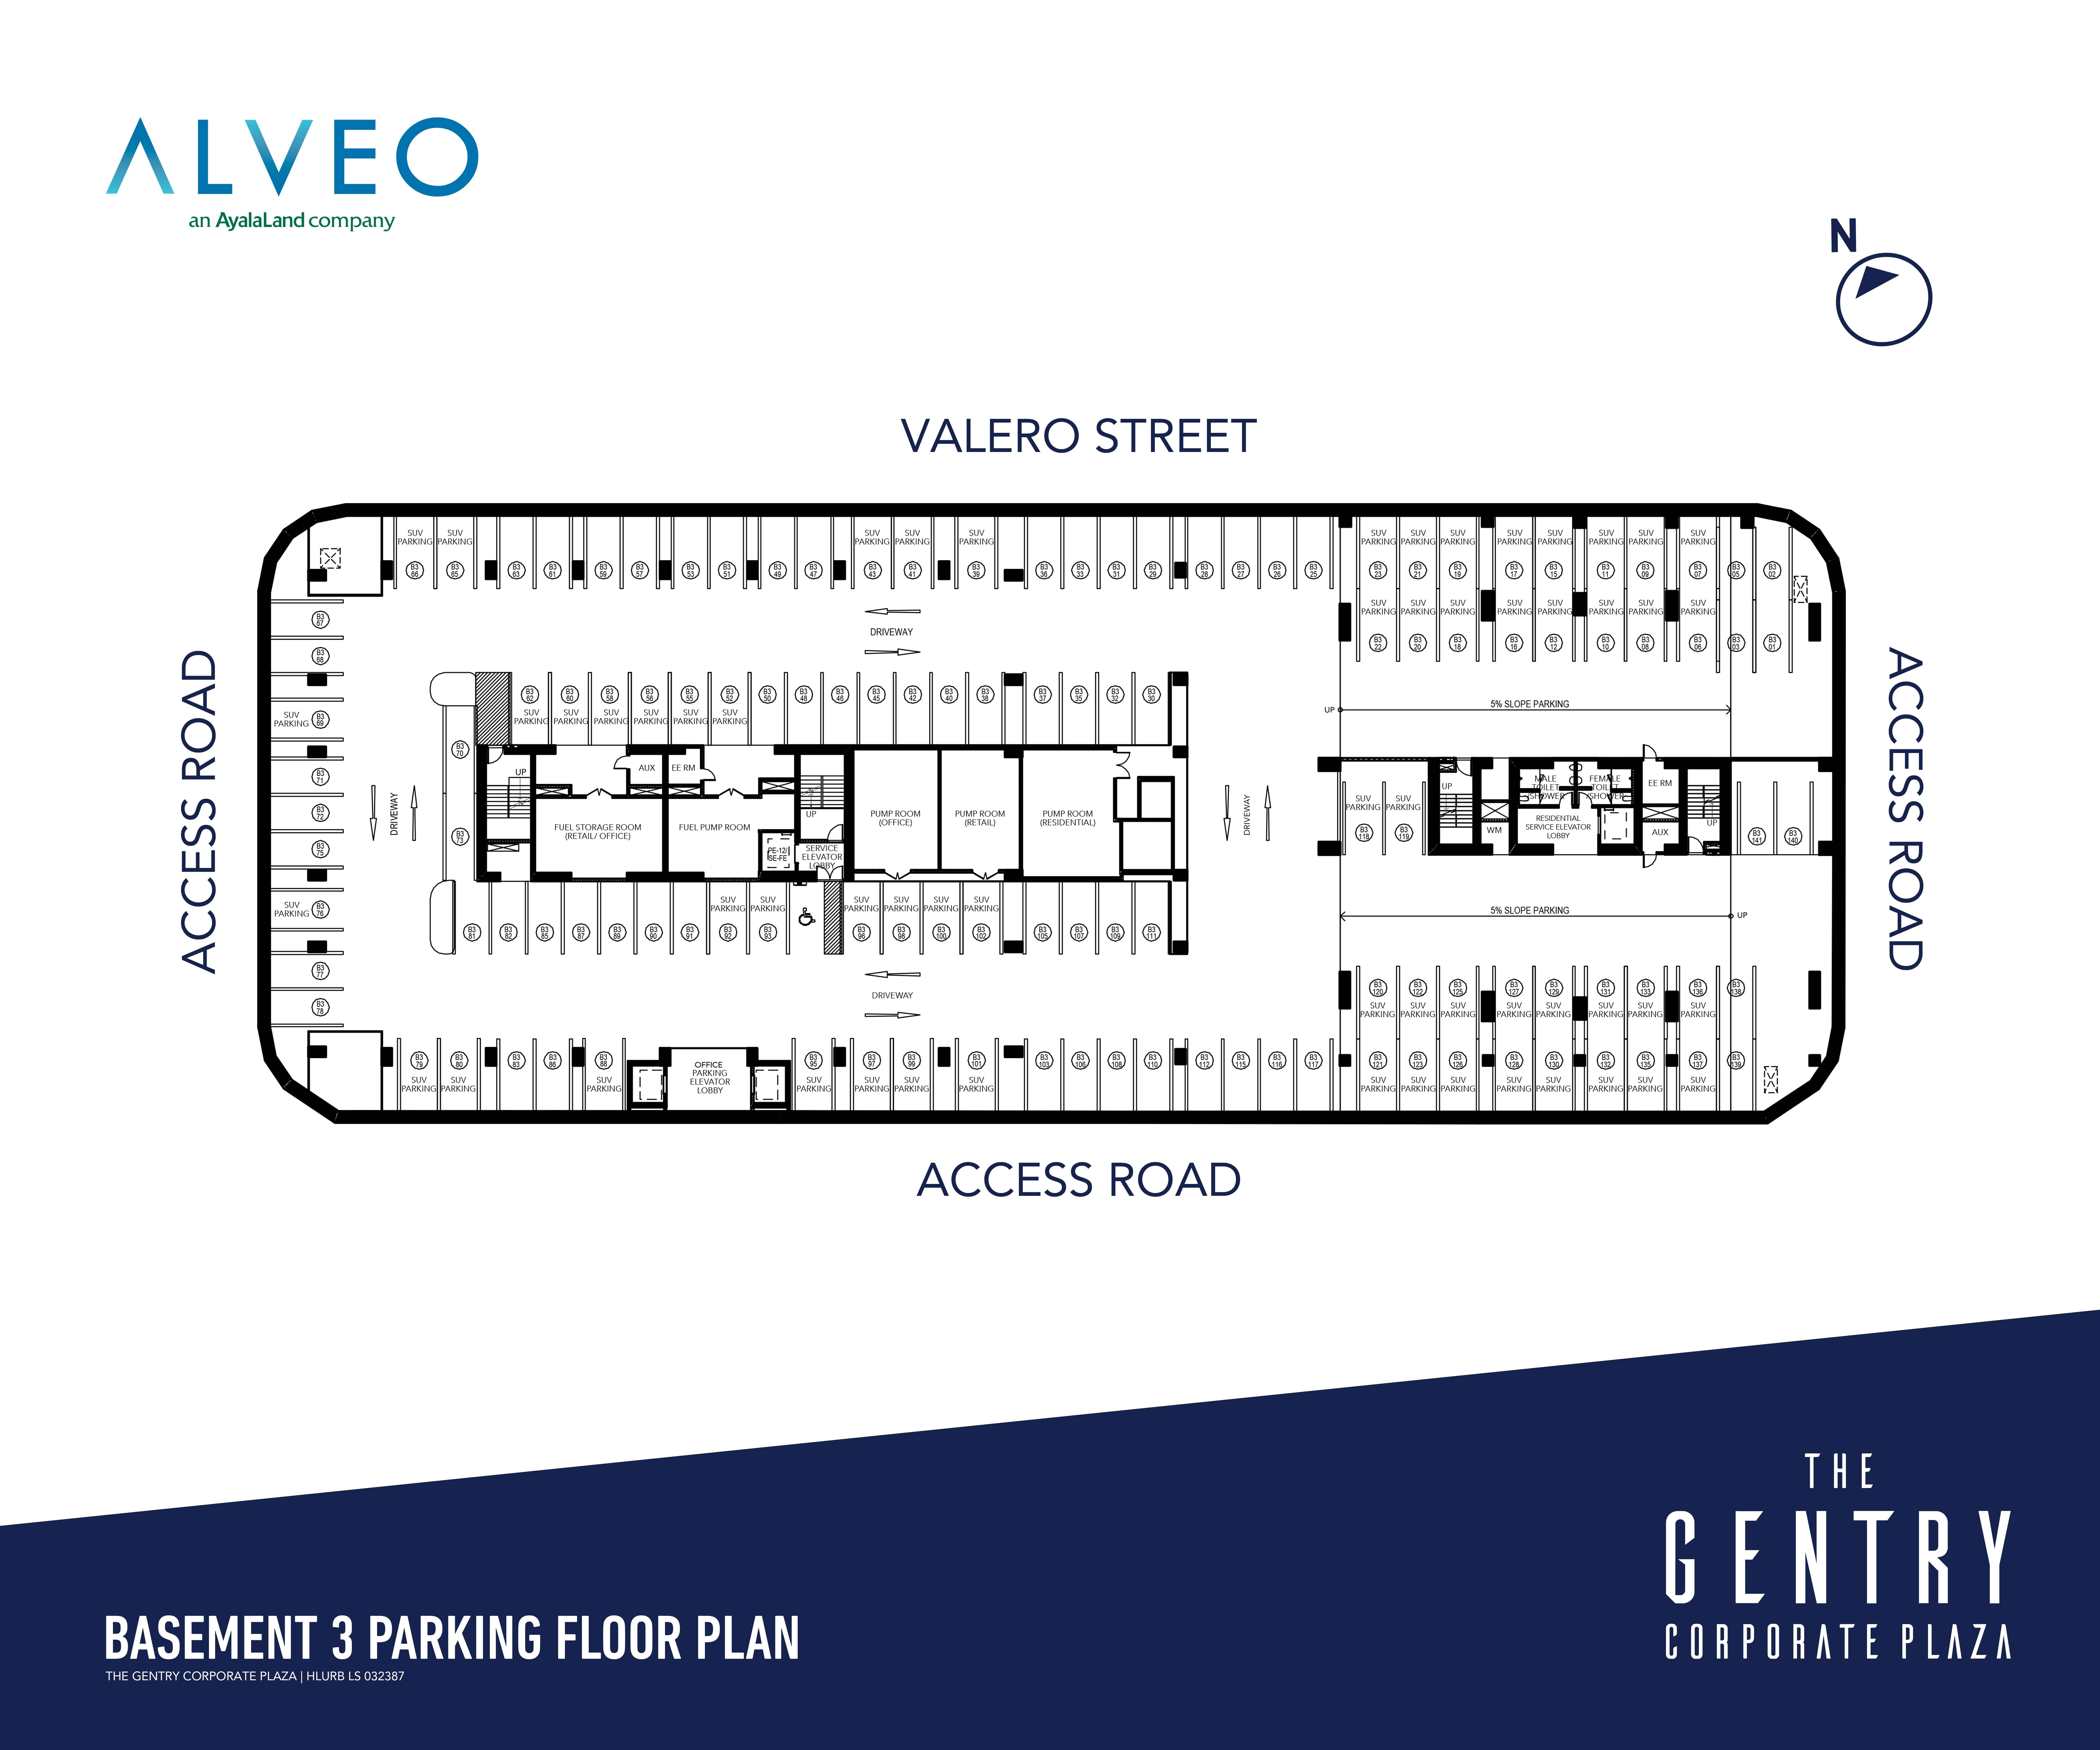 the-gentry-corporate-plaza---basement-3-floor-plan_35297818046_o